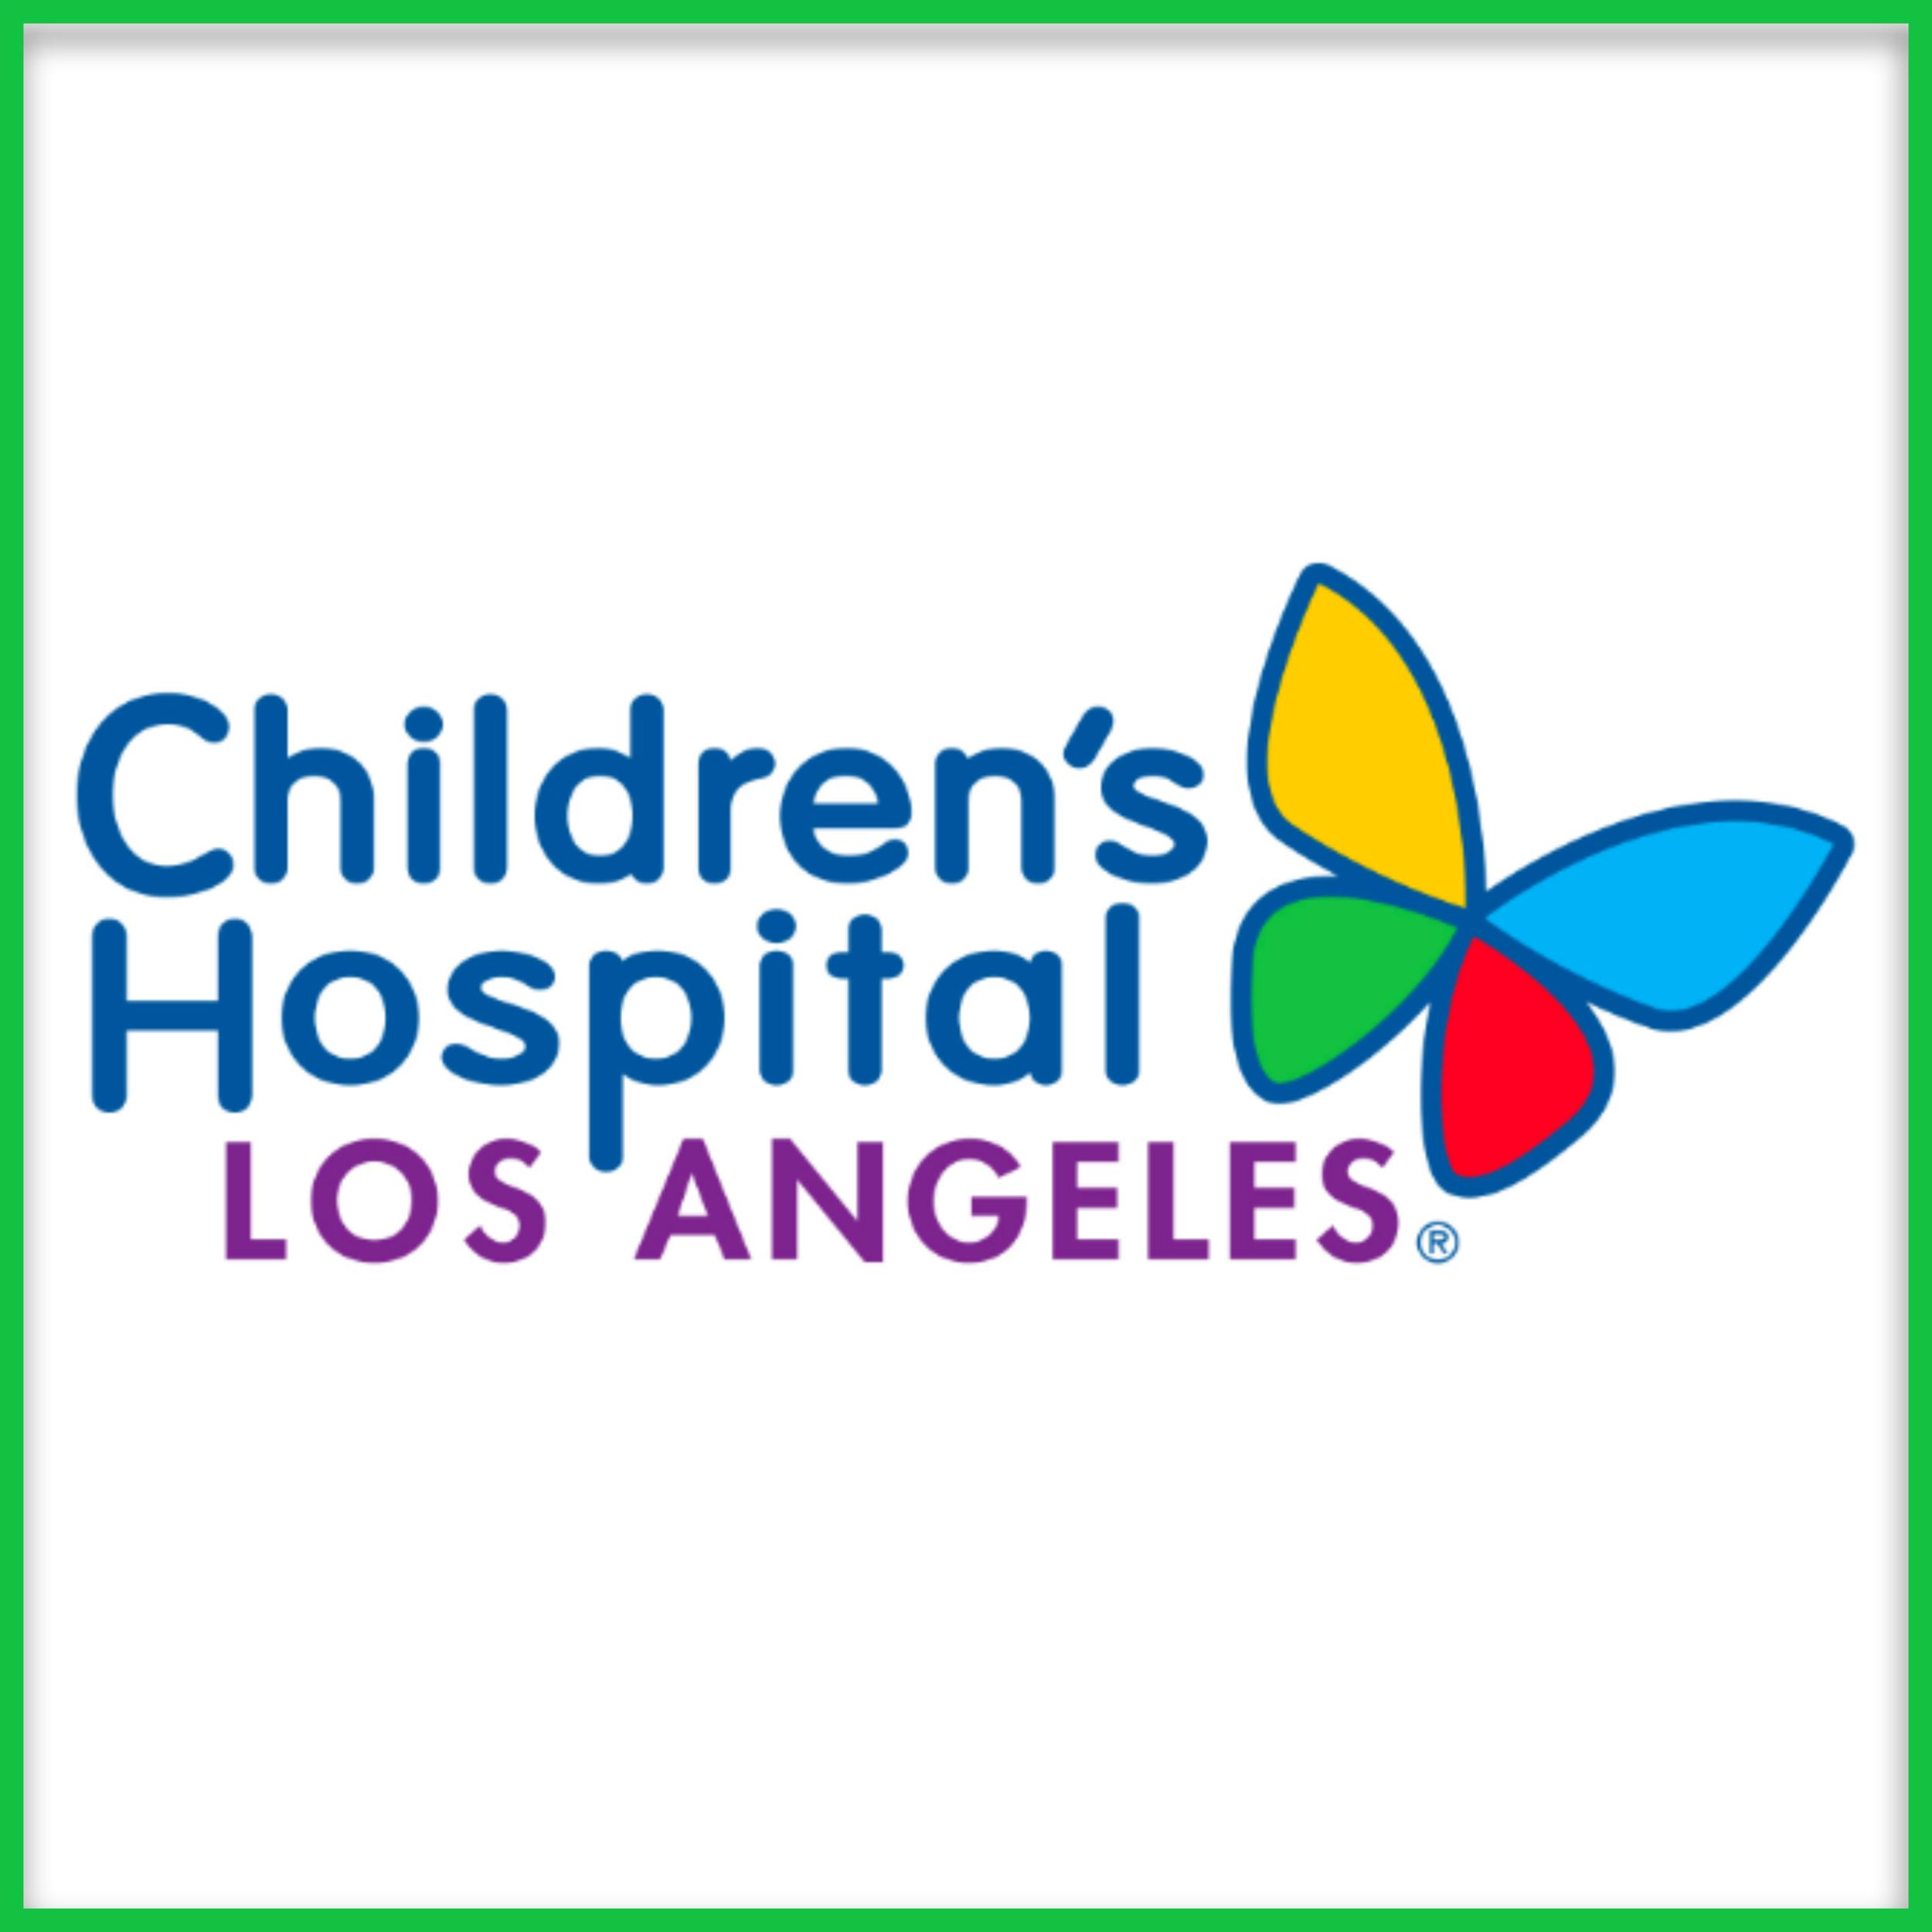 Los Angeles Children_s Hospital.png